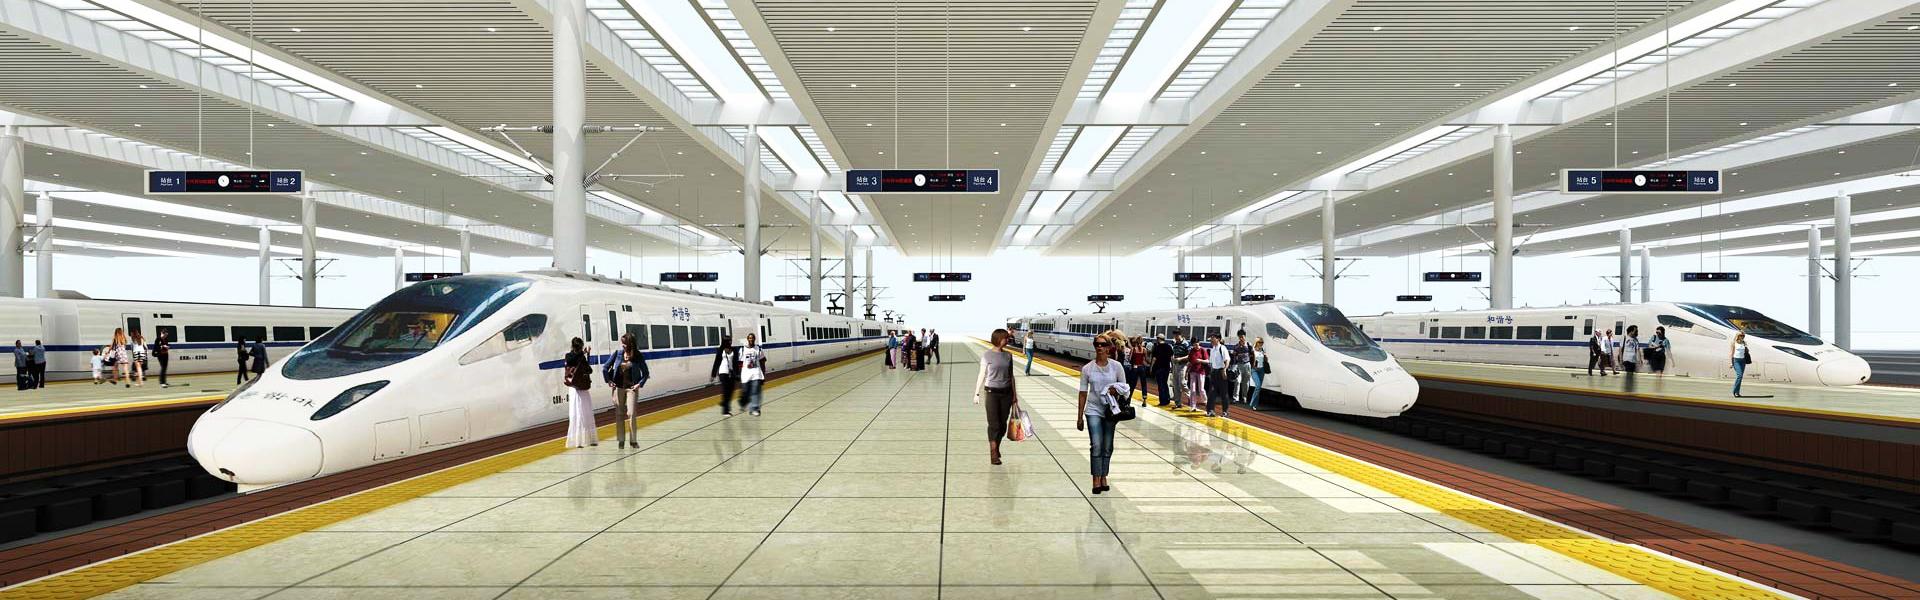 Shanghai To Beijing Train Tour